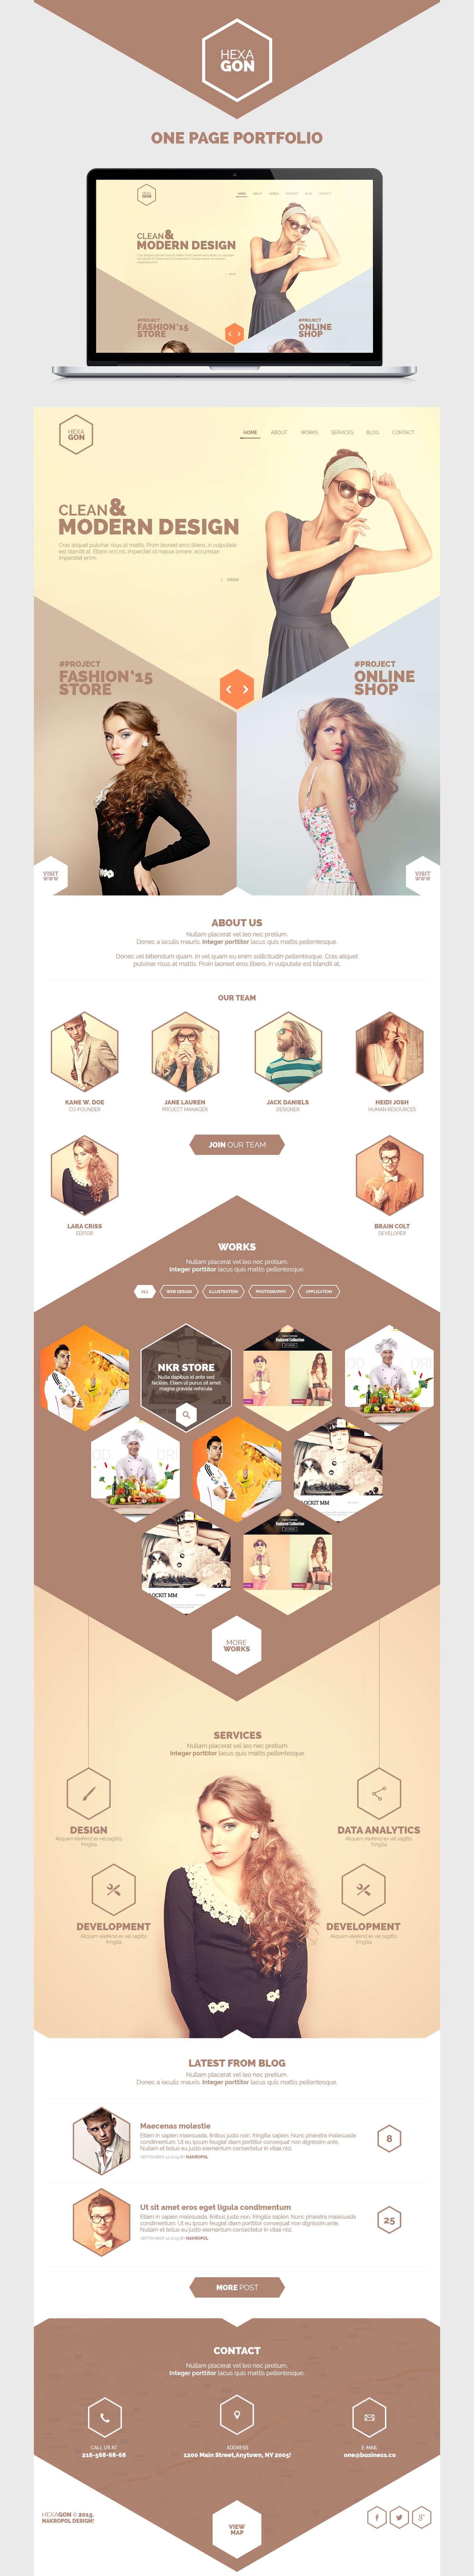 hexagon one page portfolio